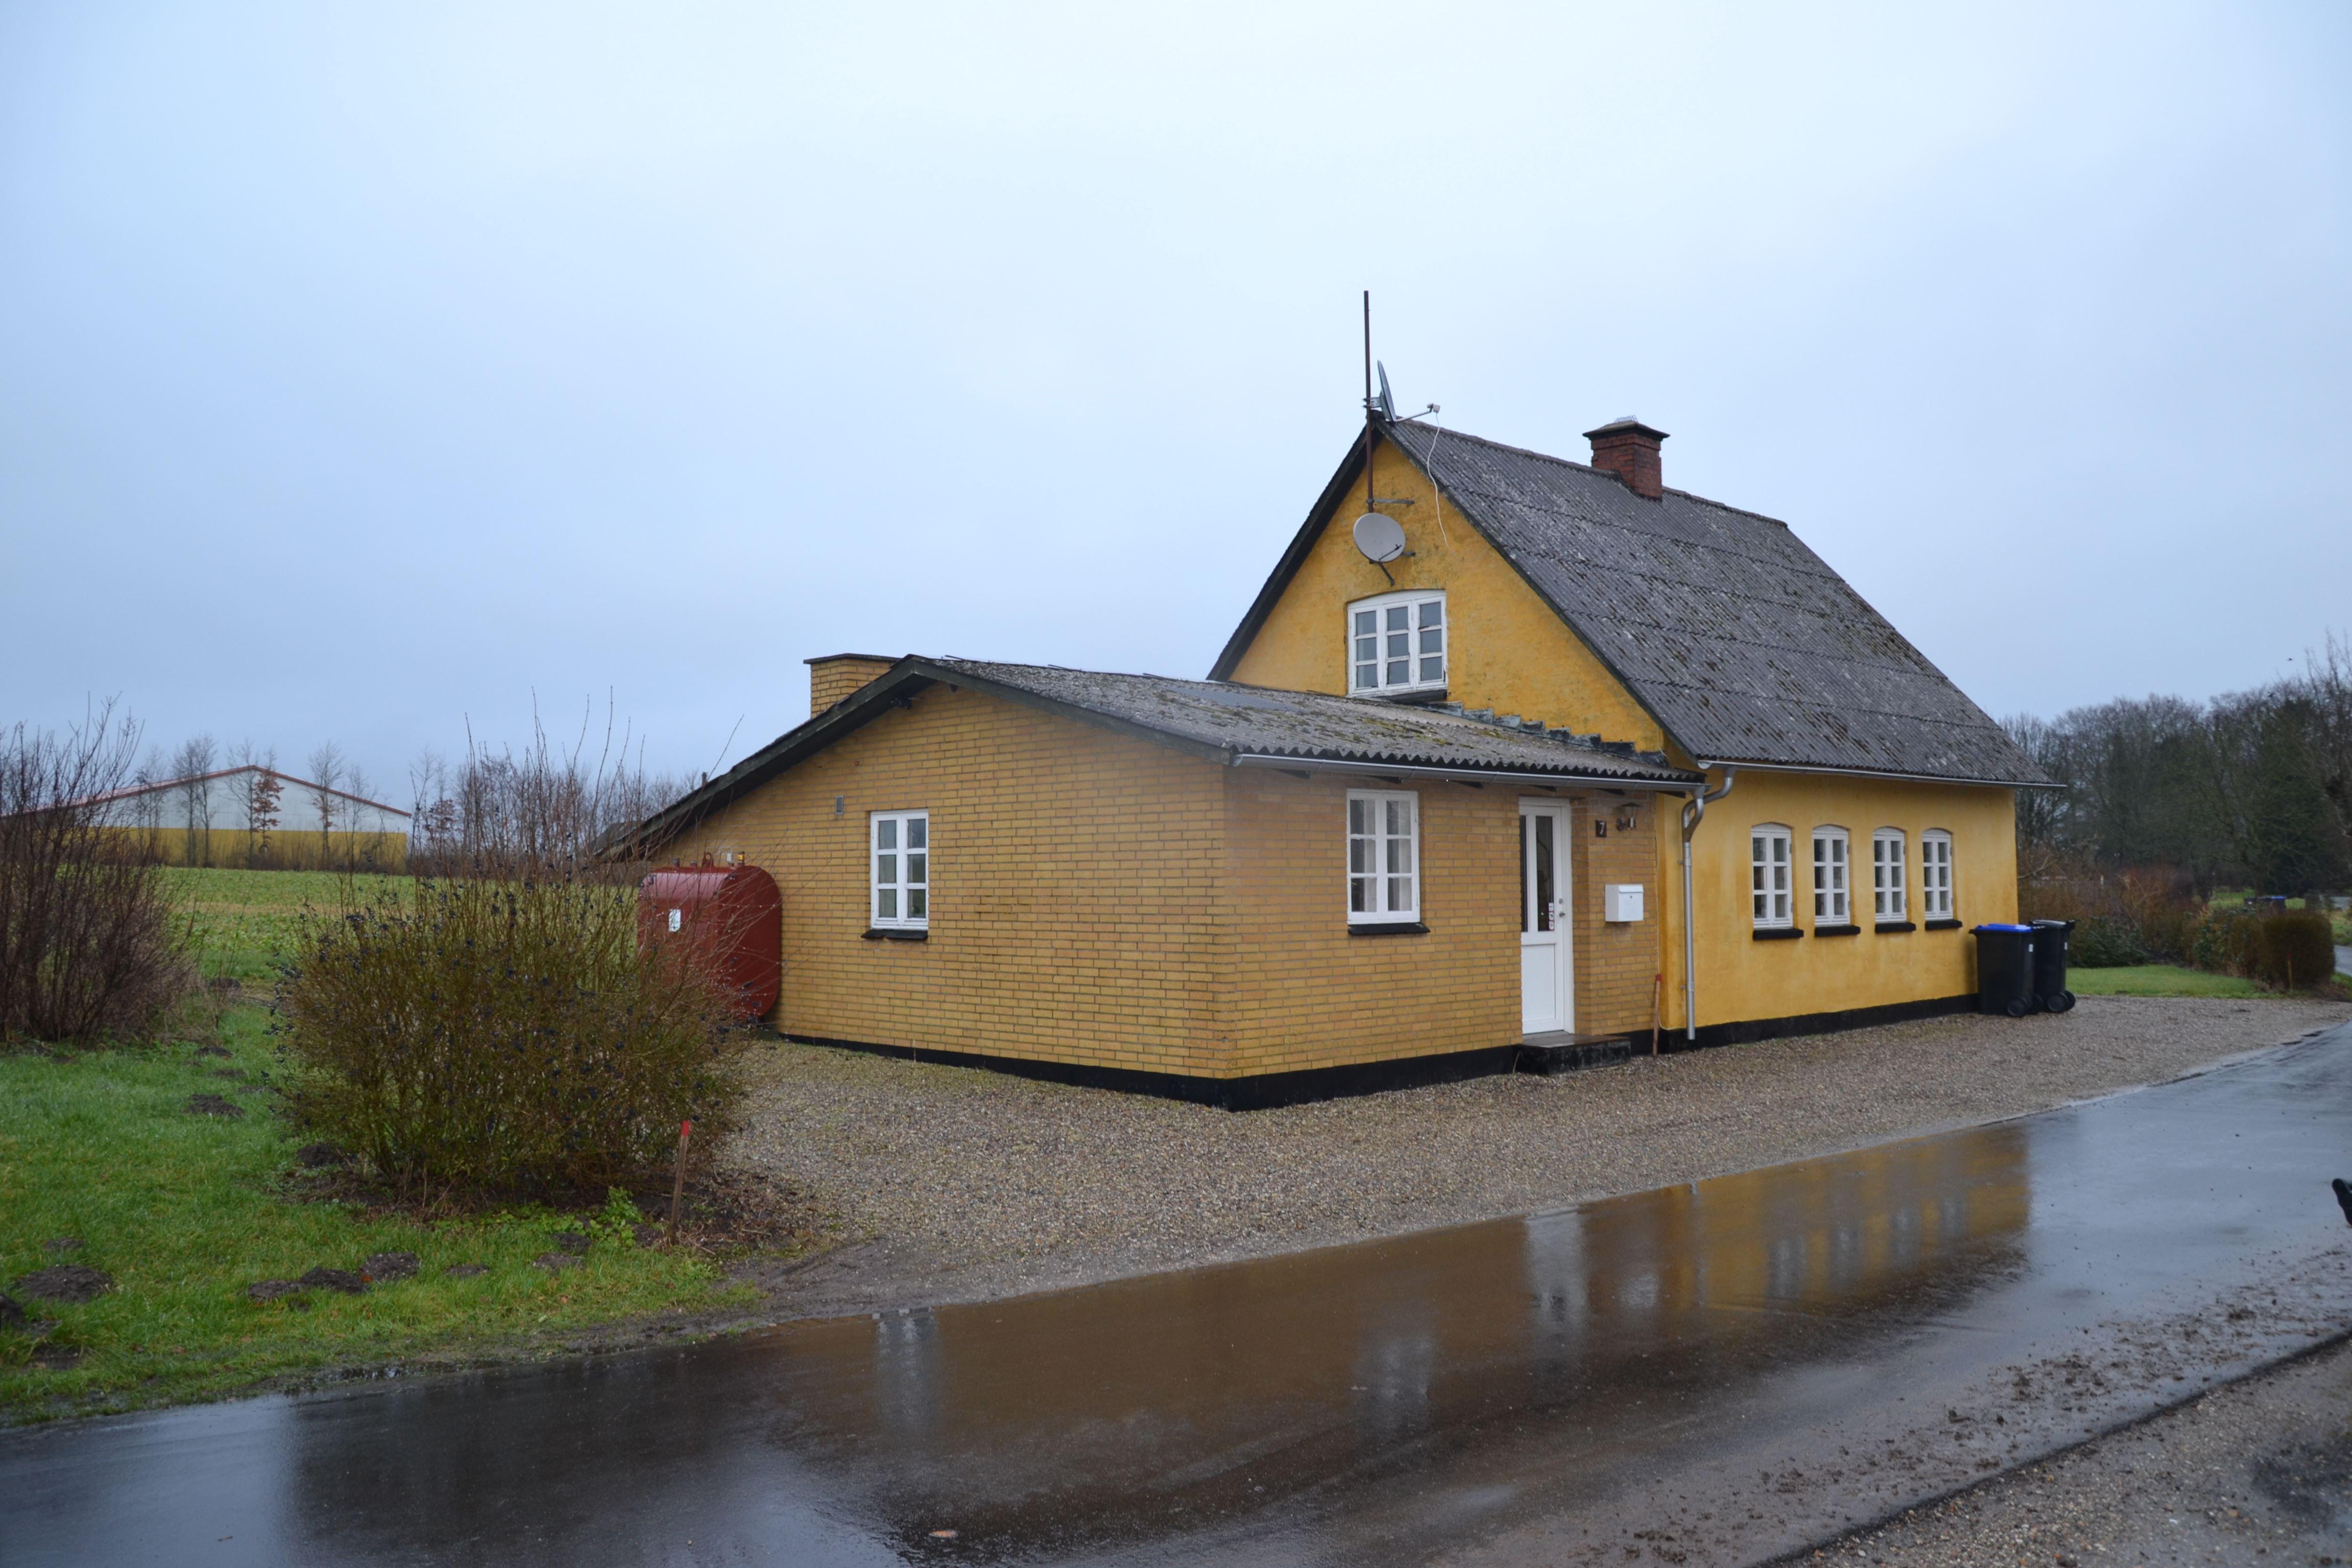 Ejlskov Hede 7, Ejlskov, 5471 Søndersø